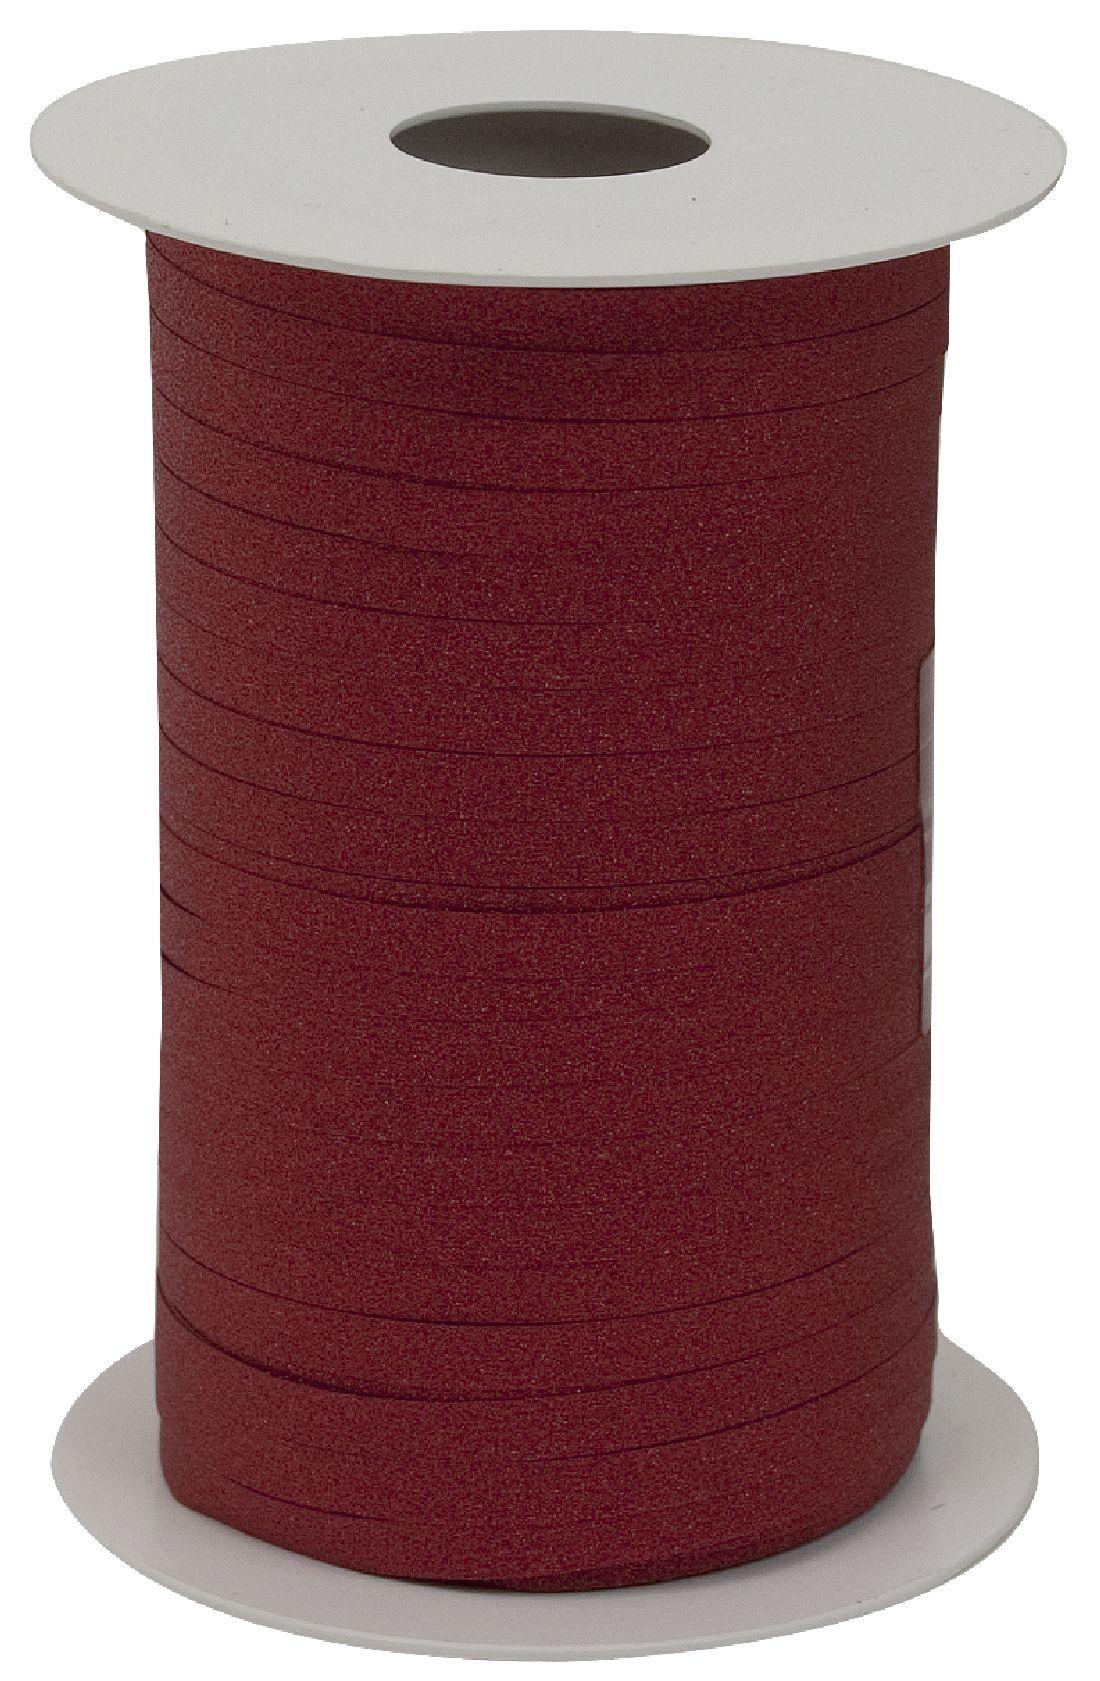 Kräuselband Glamour ROT 8146 20 Breite 5mm  Rolle=150Meter